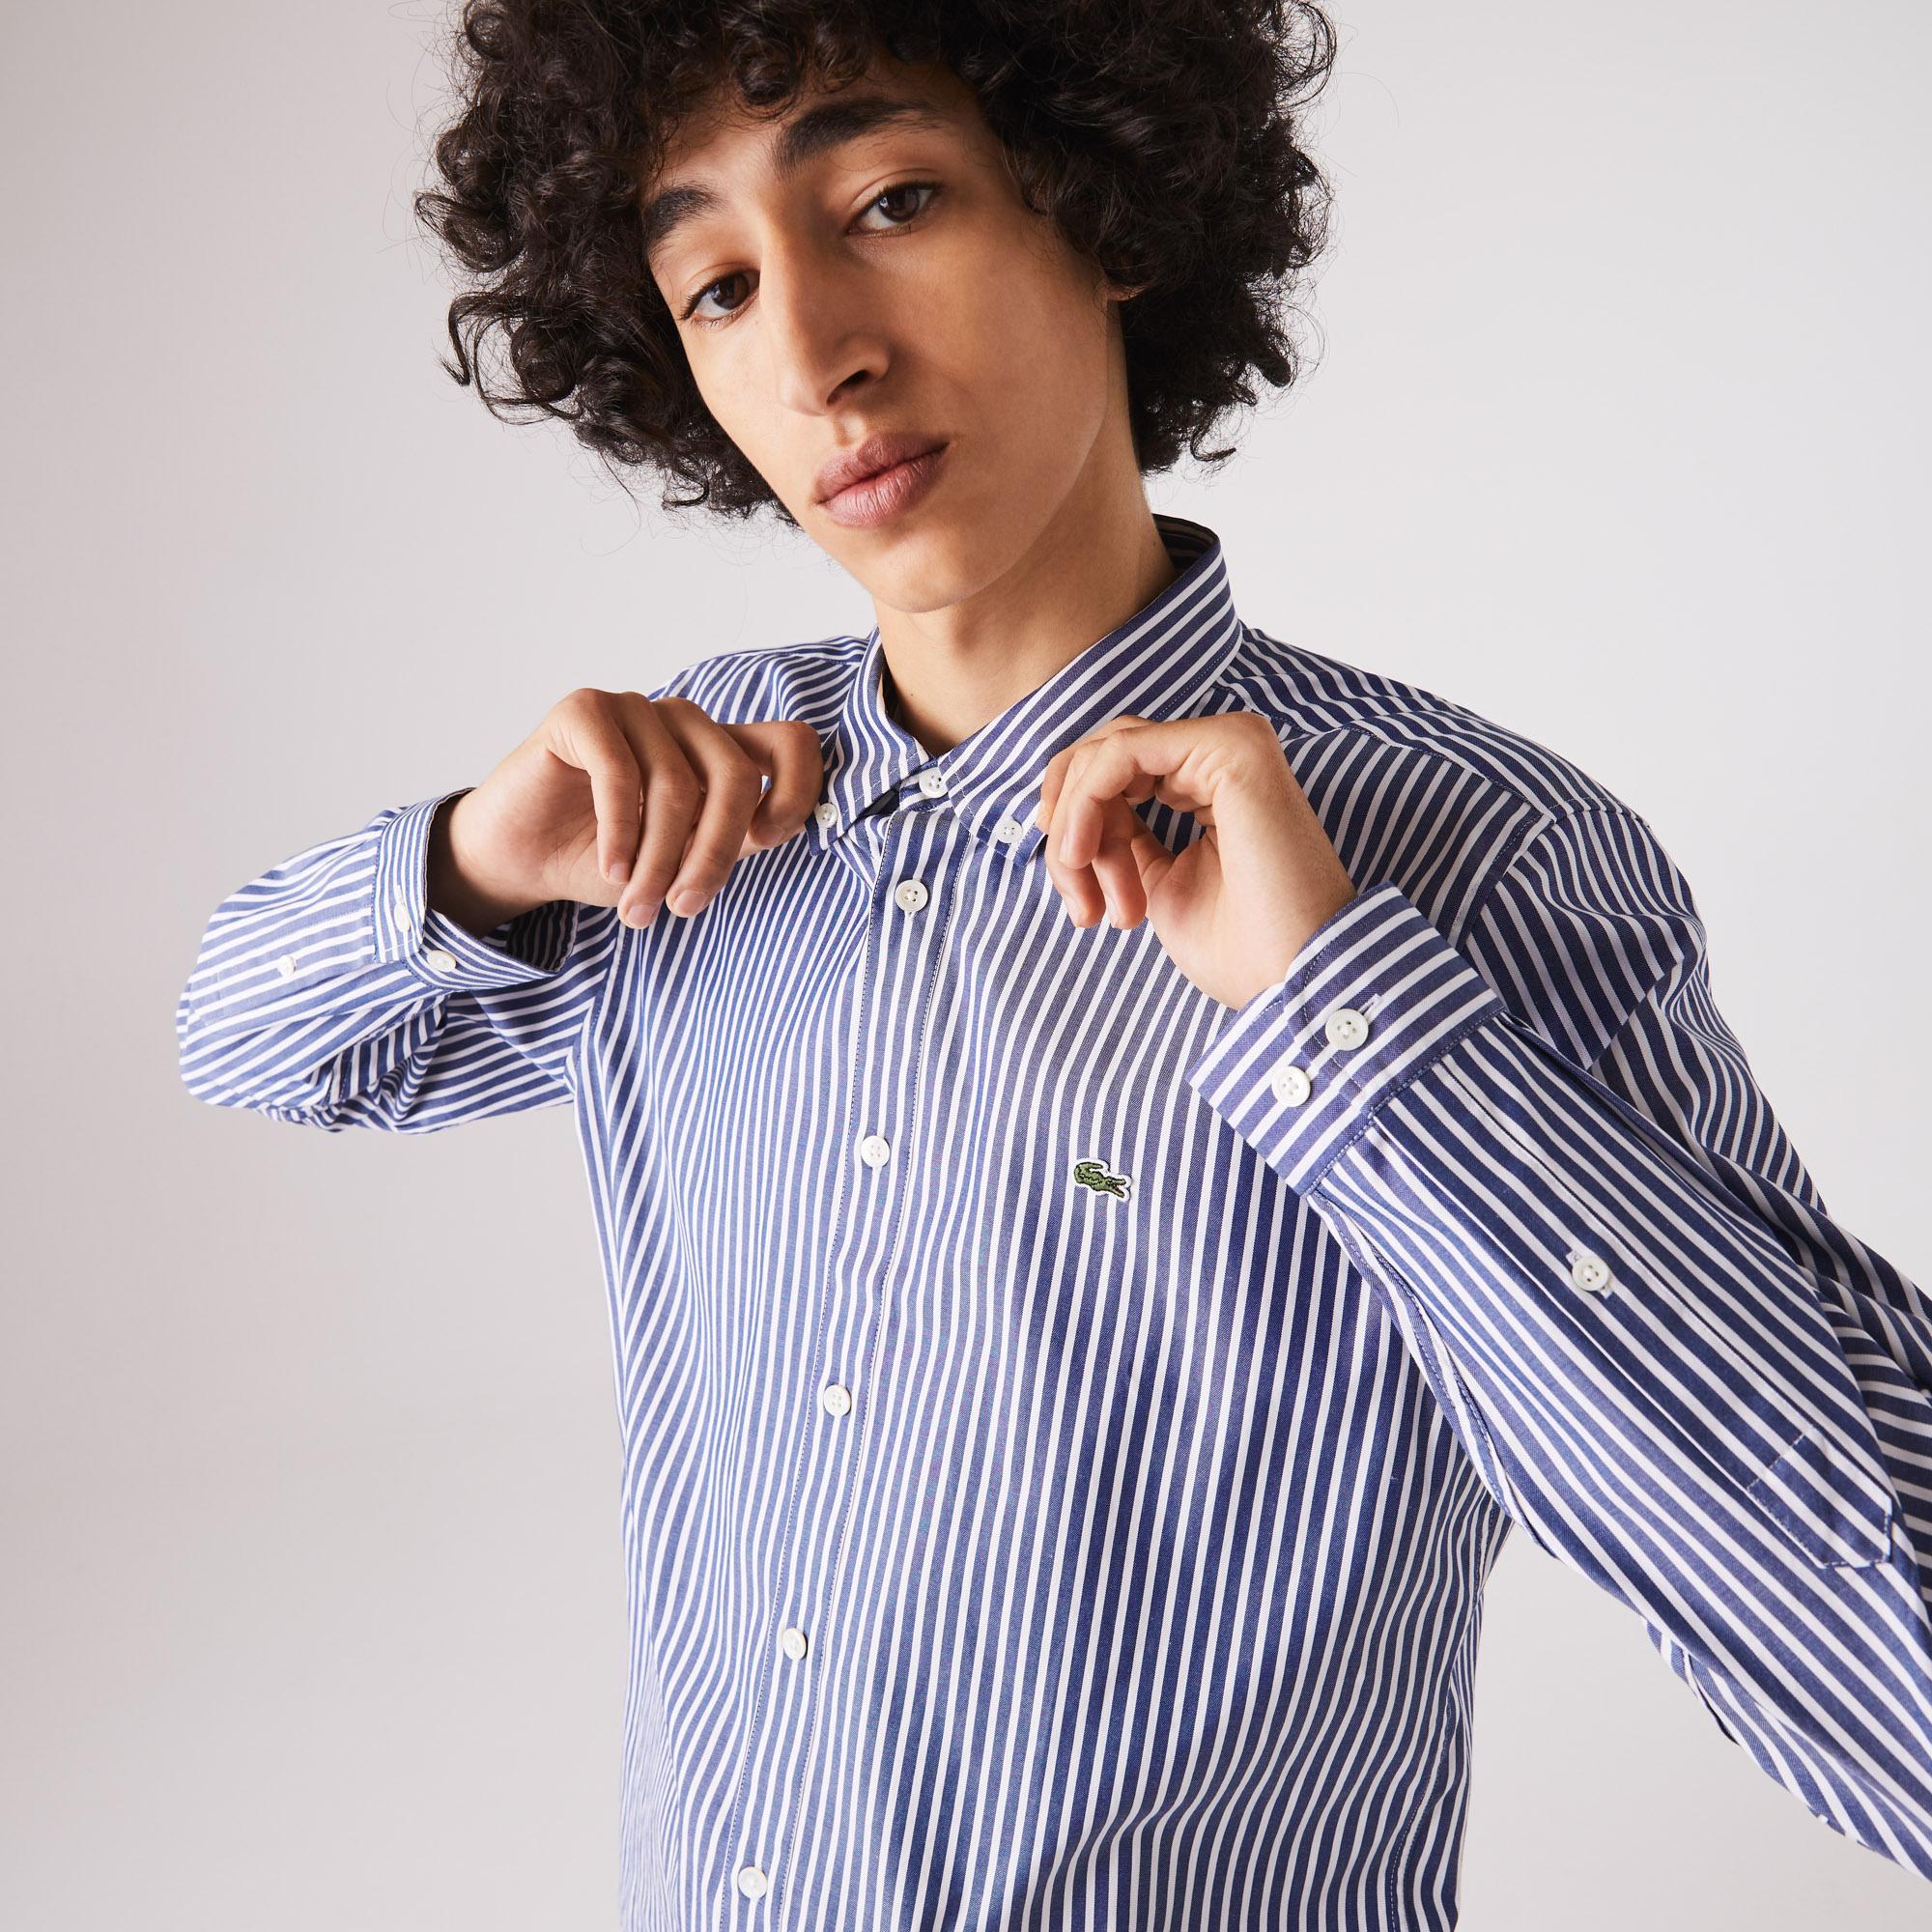 Lacoste Erkek Regular Fit Çizgili Lacivert Gömlek